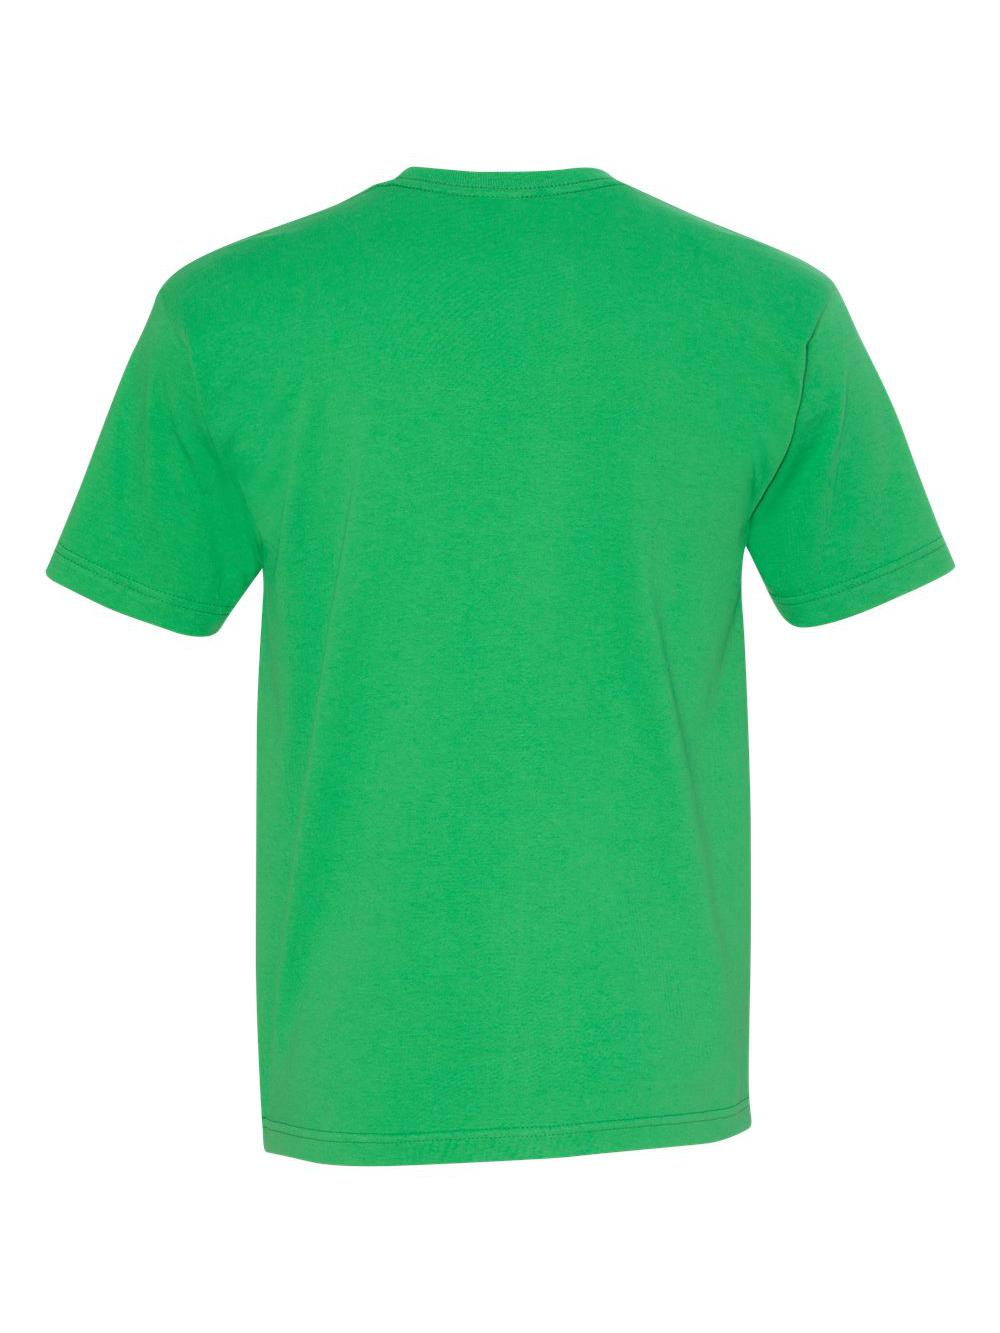 Bayside-USA-Made-100-Cotton-Short-Sleeve-T-Shirt-5040 thumbnail 19